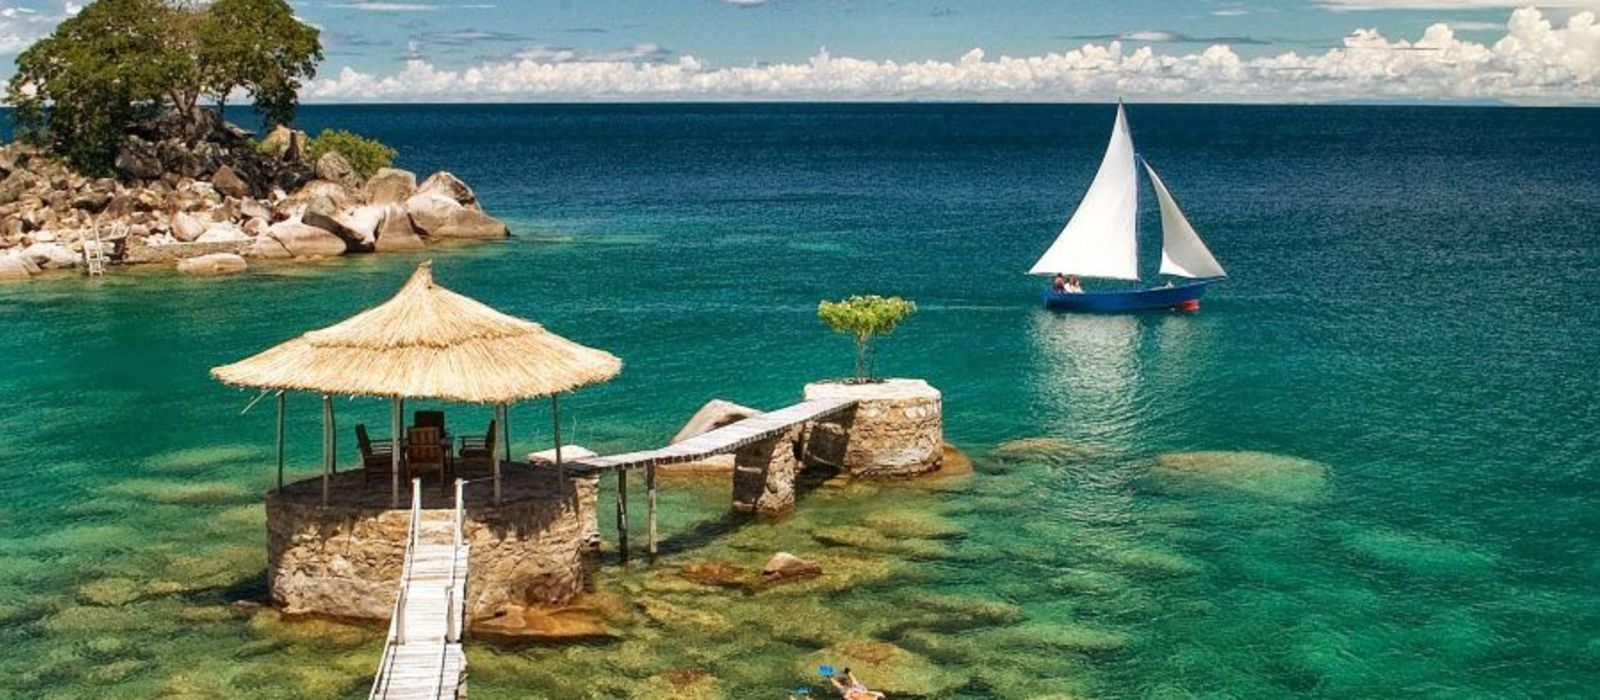 Malawi, Sambia und Mosambik: Safari, Malawisee und Strand Urlaub 1